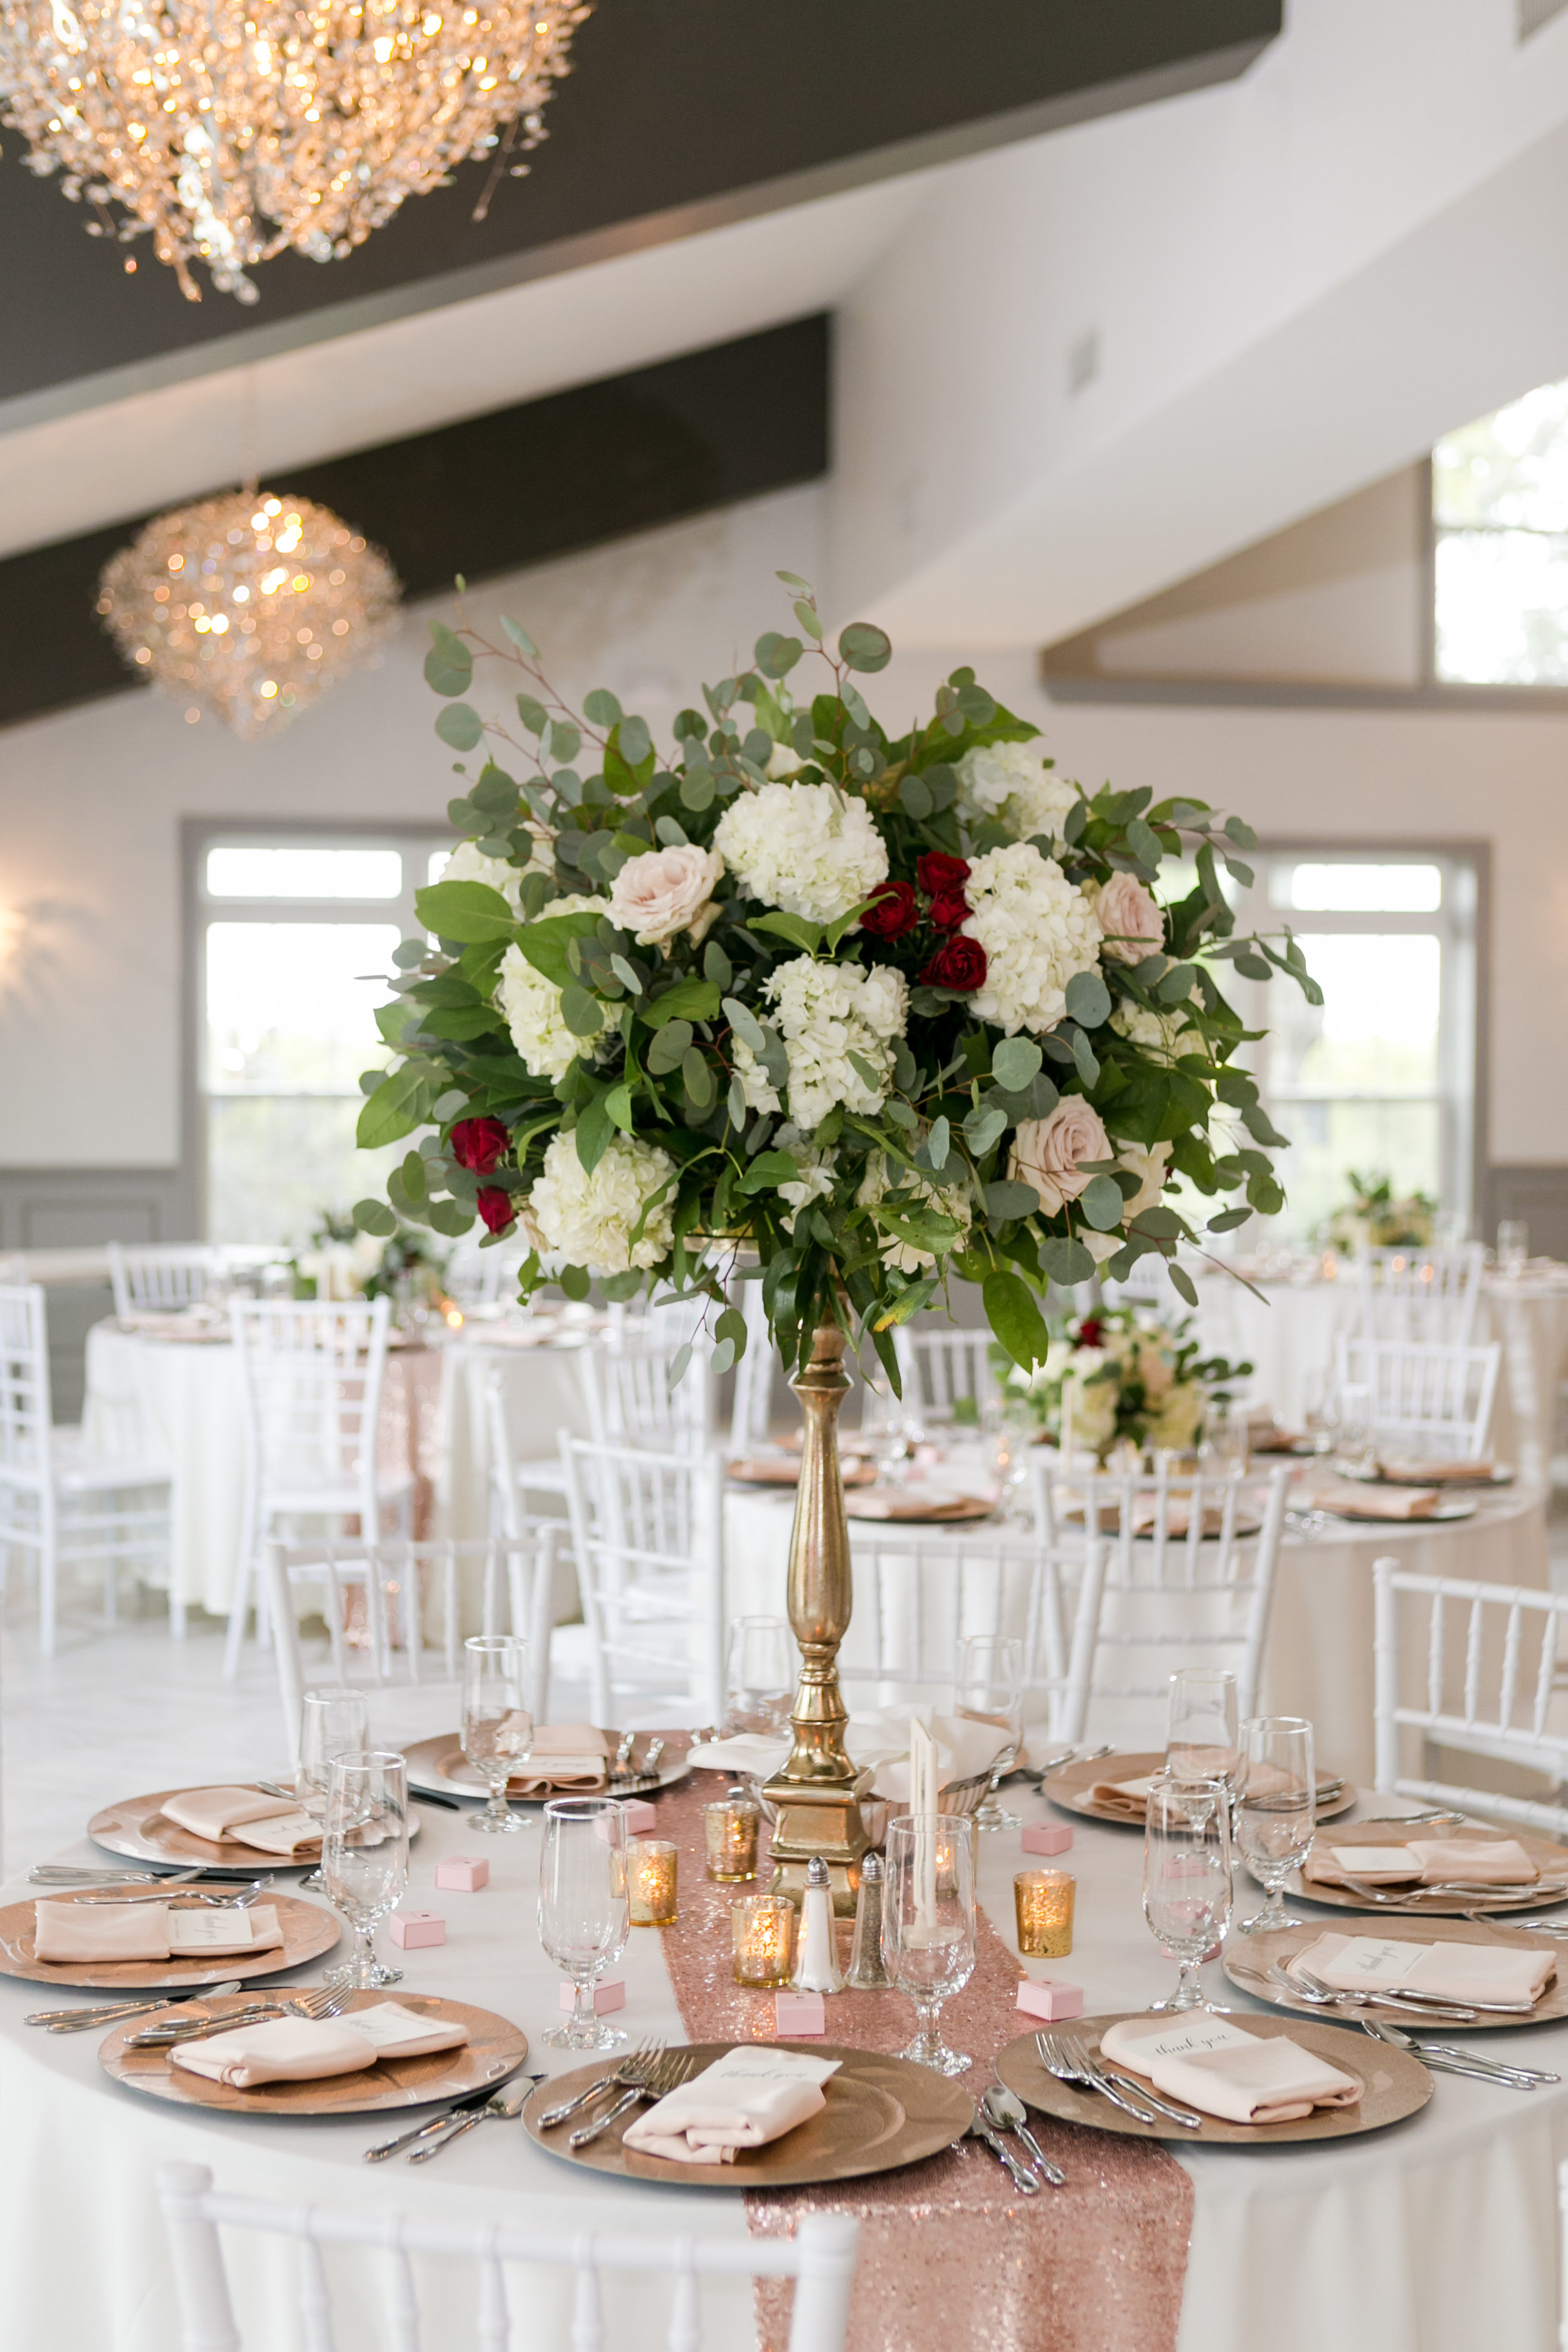 2018-1890-Event-Weddings-JanaMarie-0915.jpg